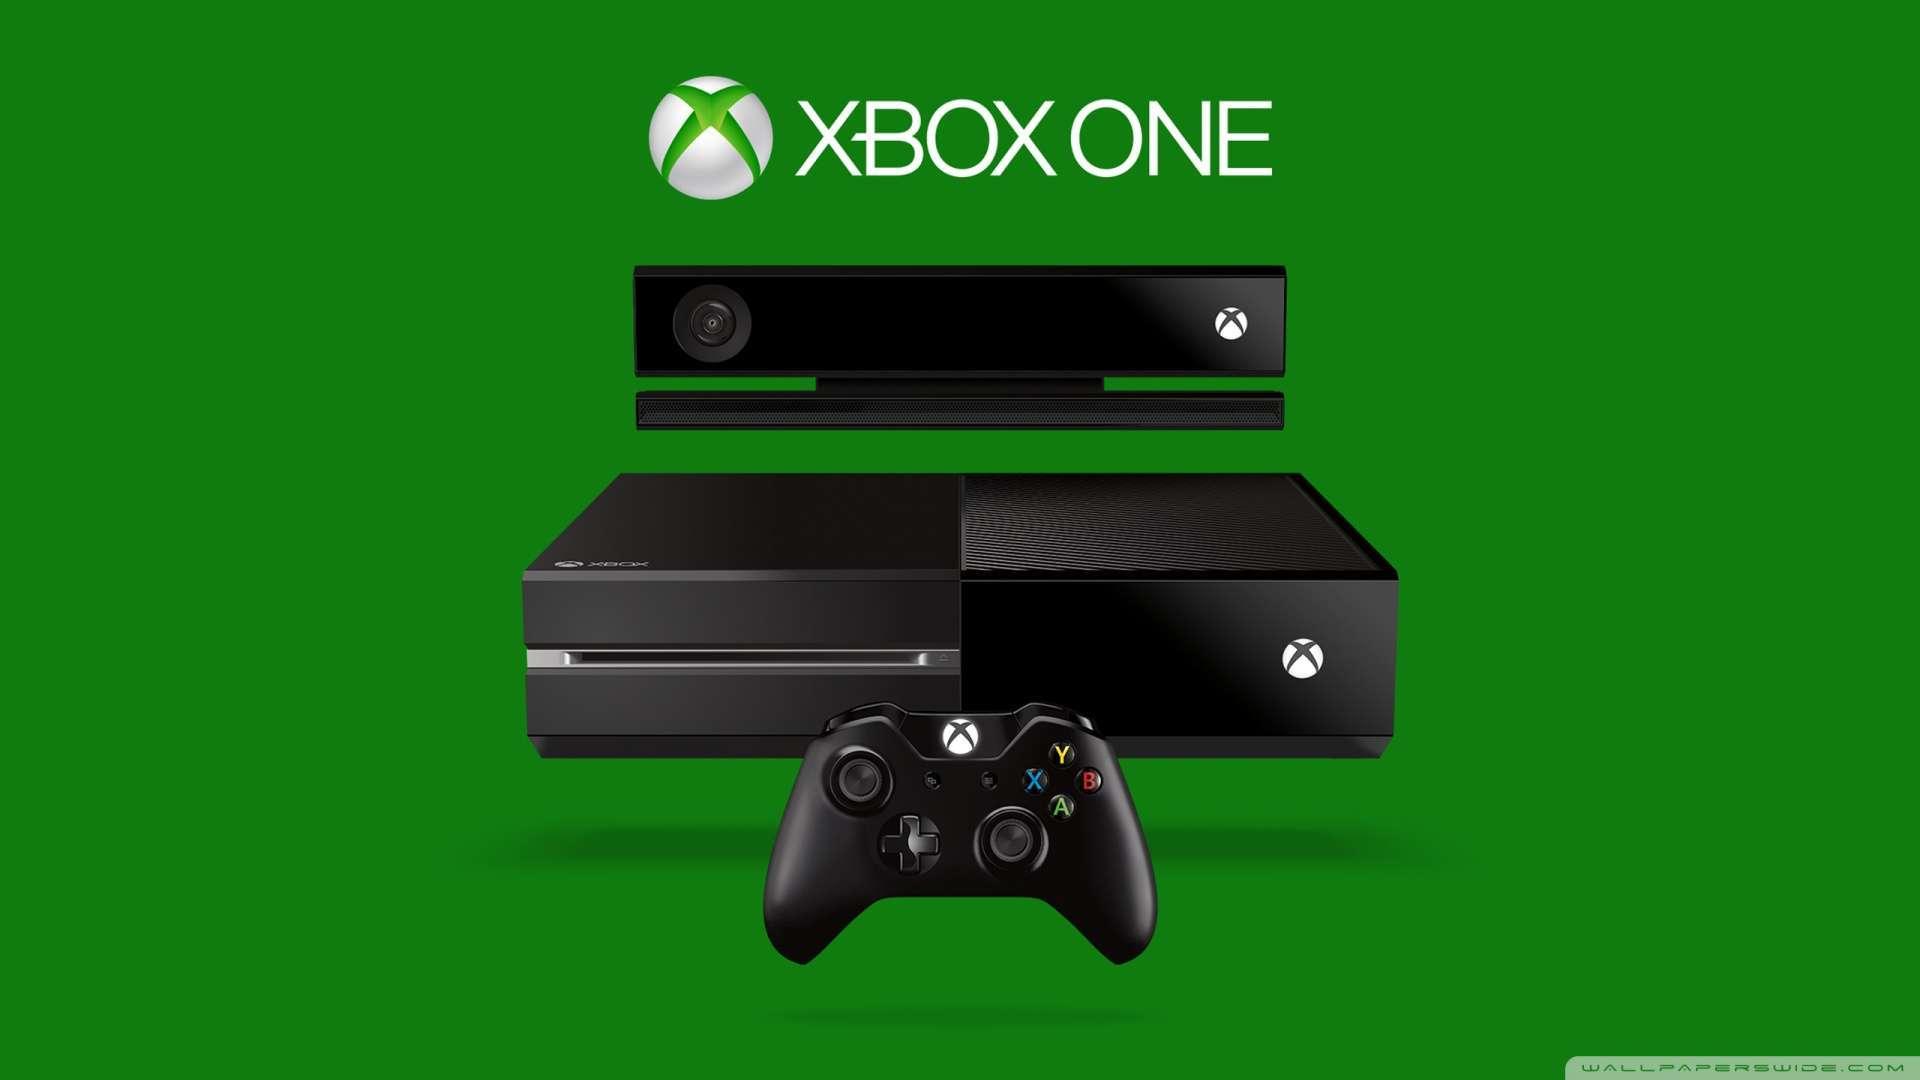 Wallpaper Xbox One Green Wallpaper Hd 1080p Upload at April 9 2014 1920x1080